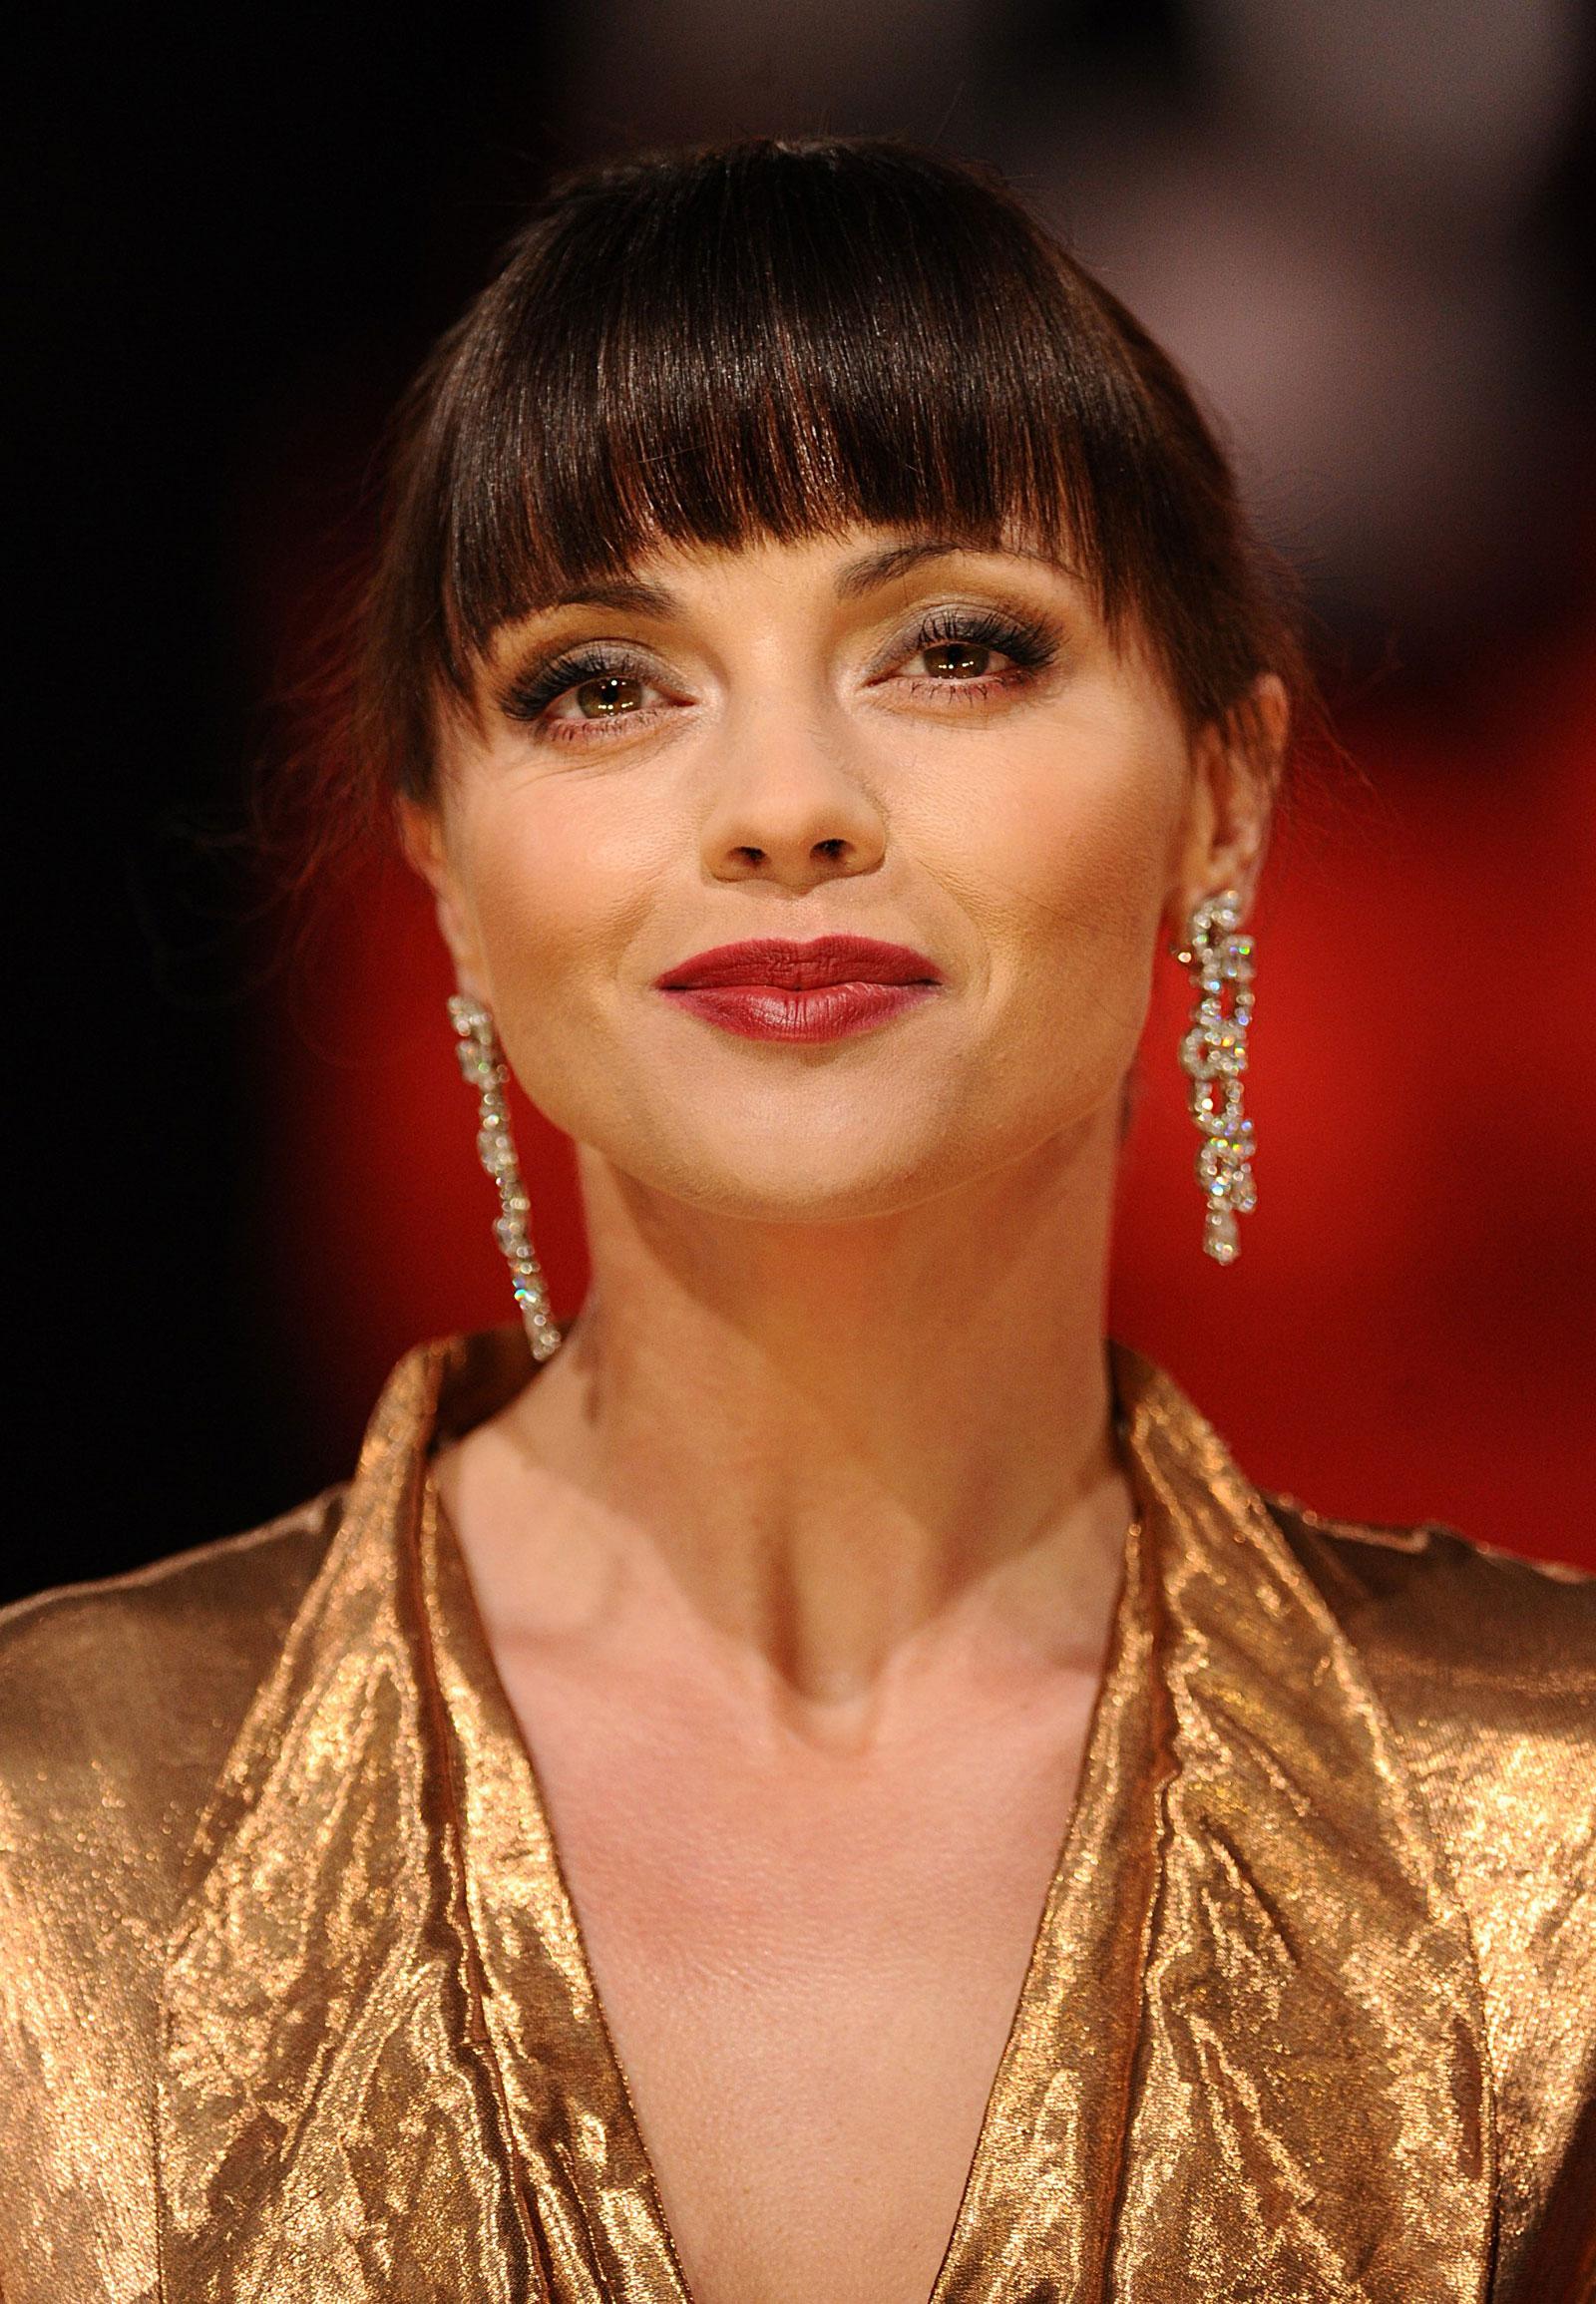 Christina Ricci at The Orange British Academy Film Awards in London Christina Ricci